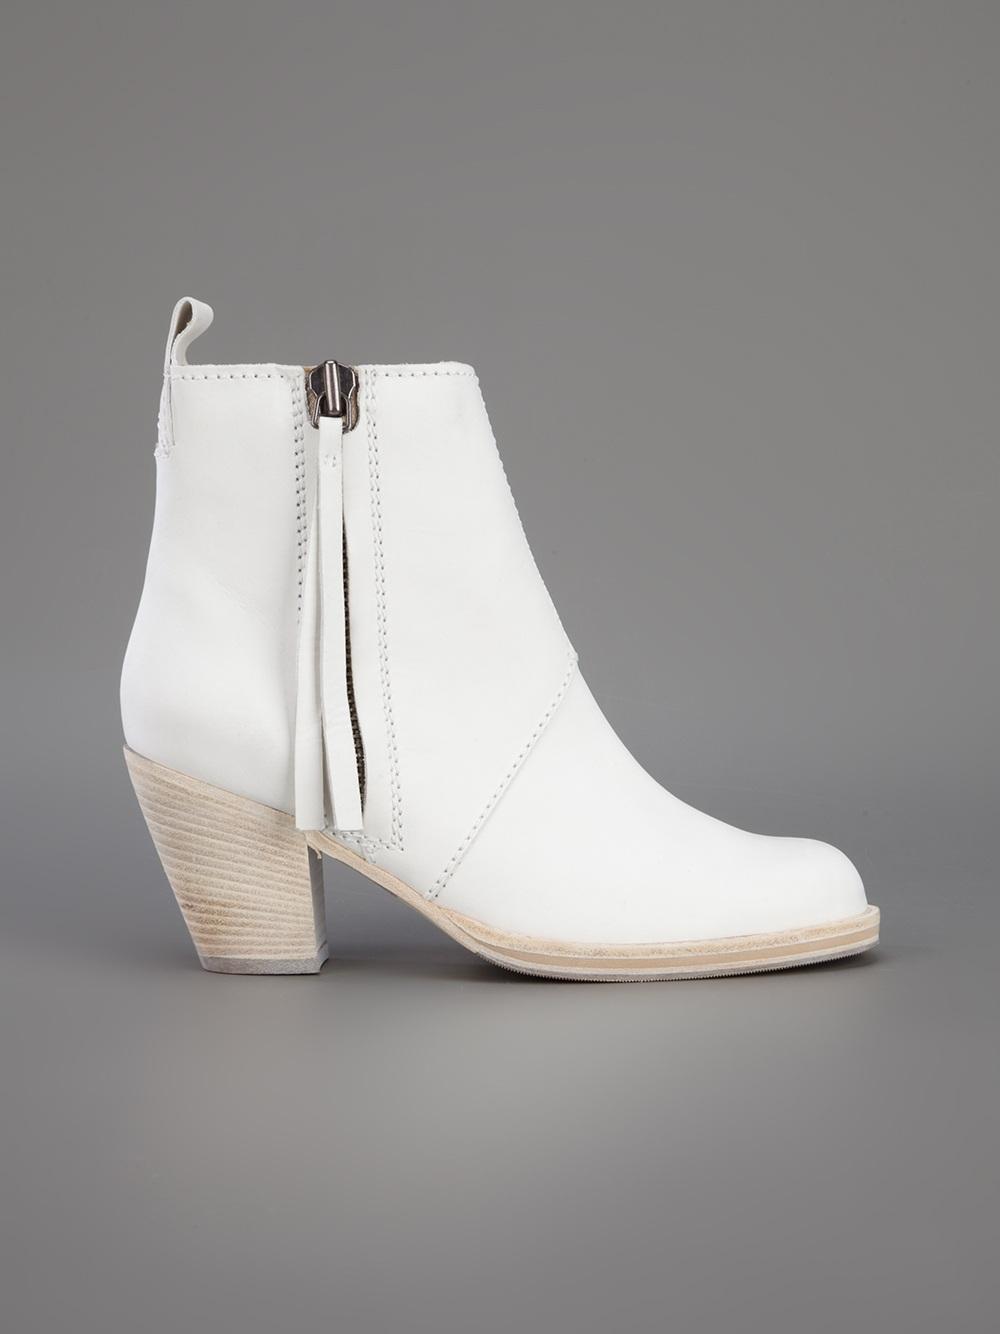 9936c5bda1977 Lyst - Acne Studios Pistol Ankle Boot in White